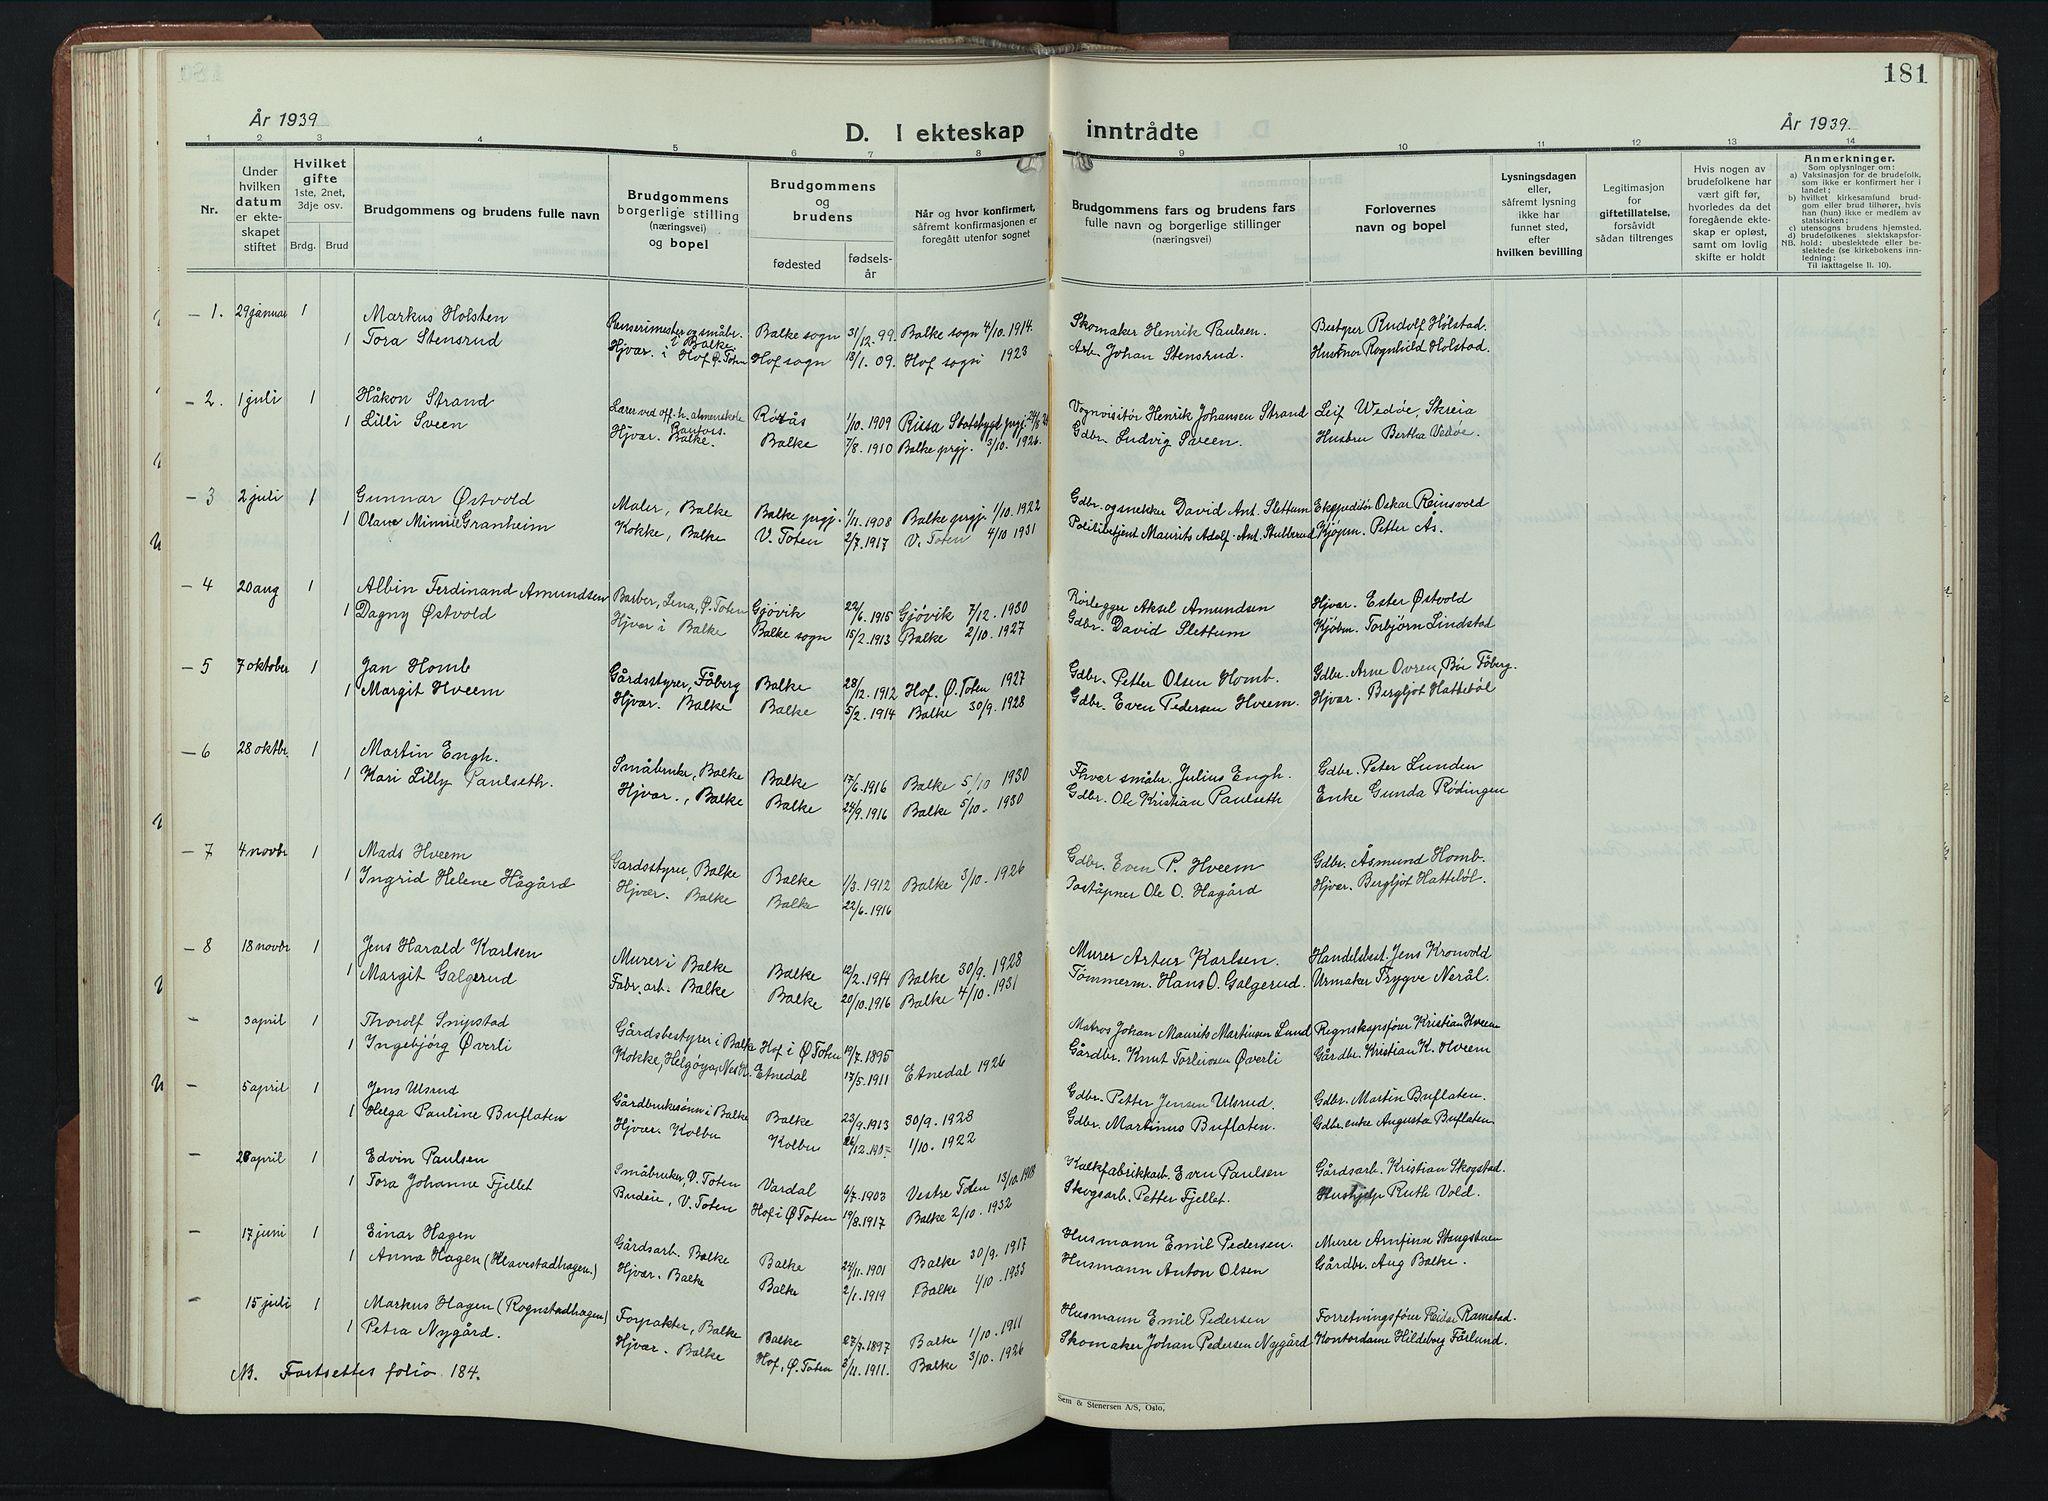 SAH, Balke prestekontor, Klokkerbok nr. 2, 1929-1951, s. 181